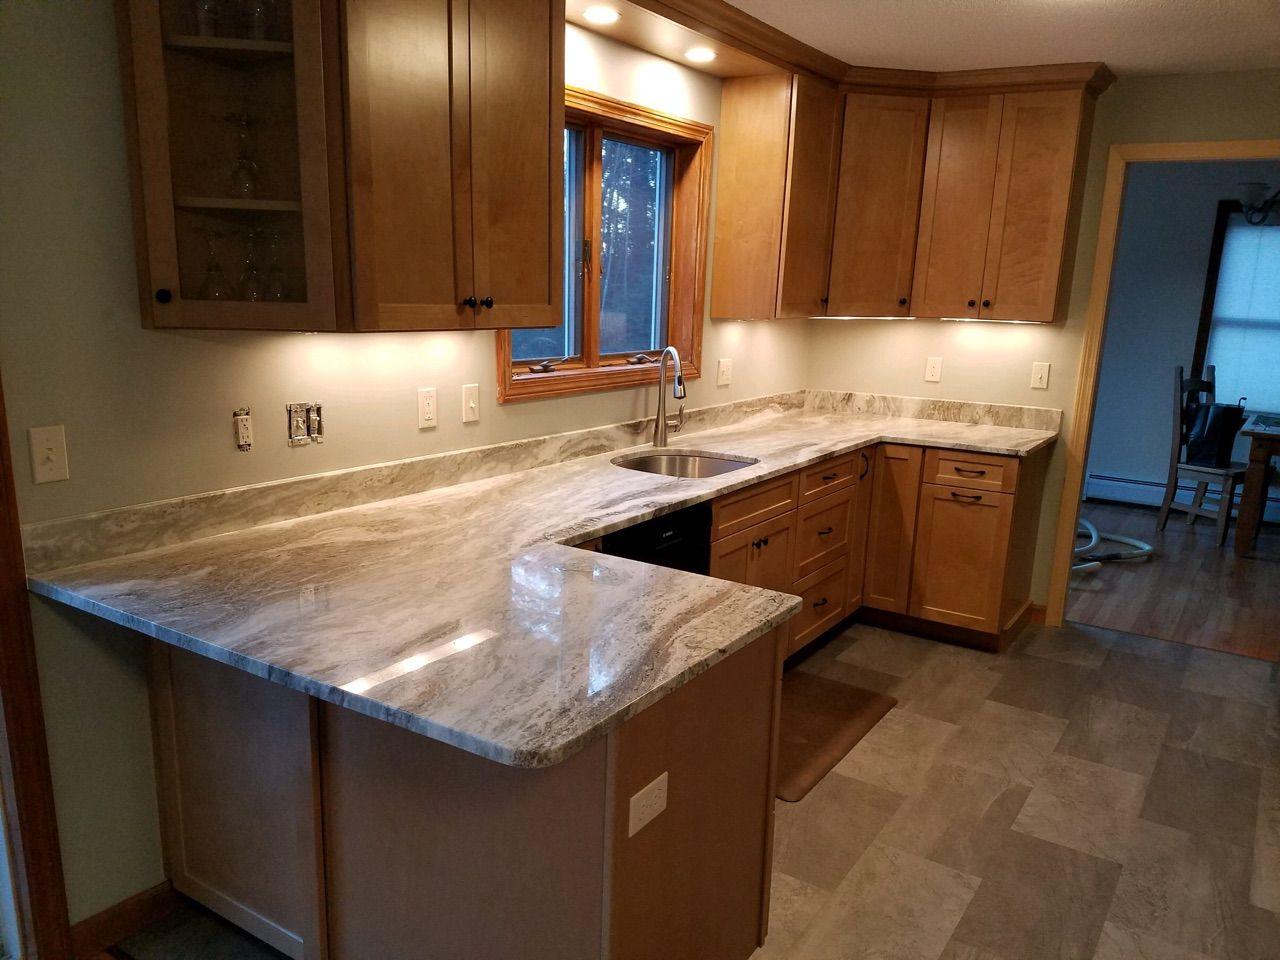 brown fantasy granite counter top waypoint cabinets in maple color rye mannington adura vinyl on kitchen remodel vinyl flooring id=94170